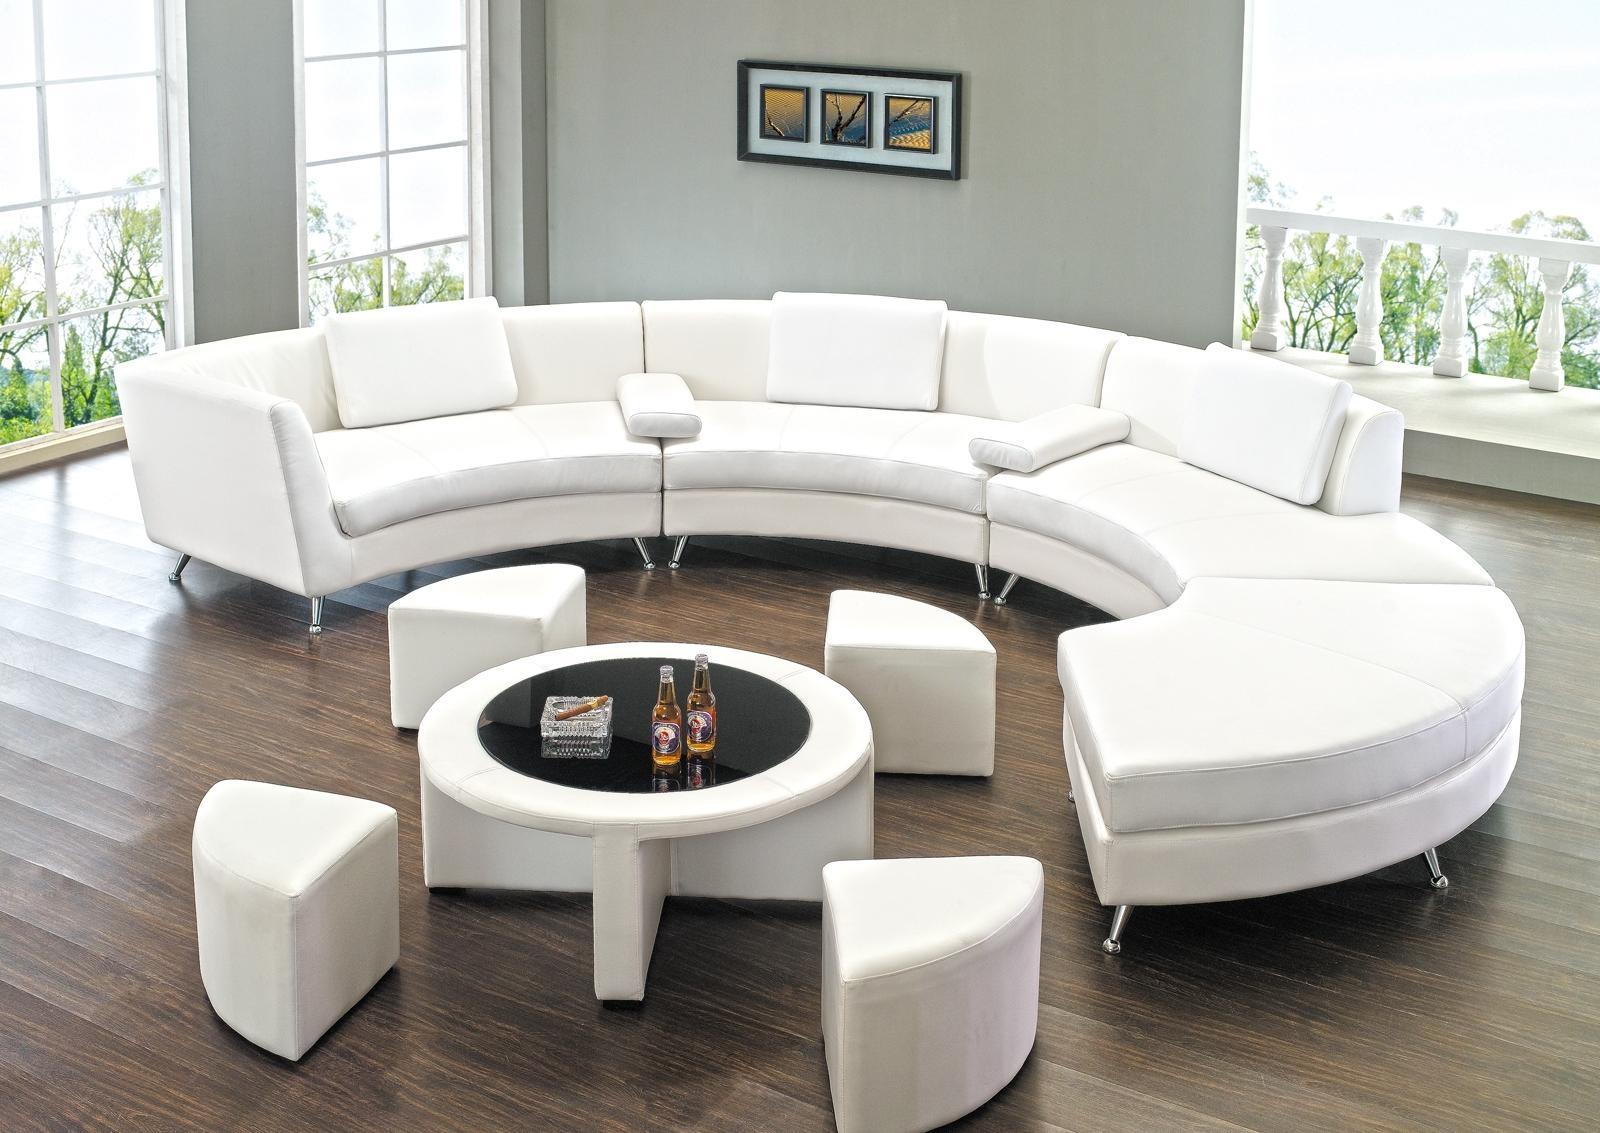 Sofas Center : Circular Sectional Sofas Outdoor Sofa Circleniture Inside Circle Sofas (View 6 of 20)